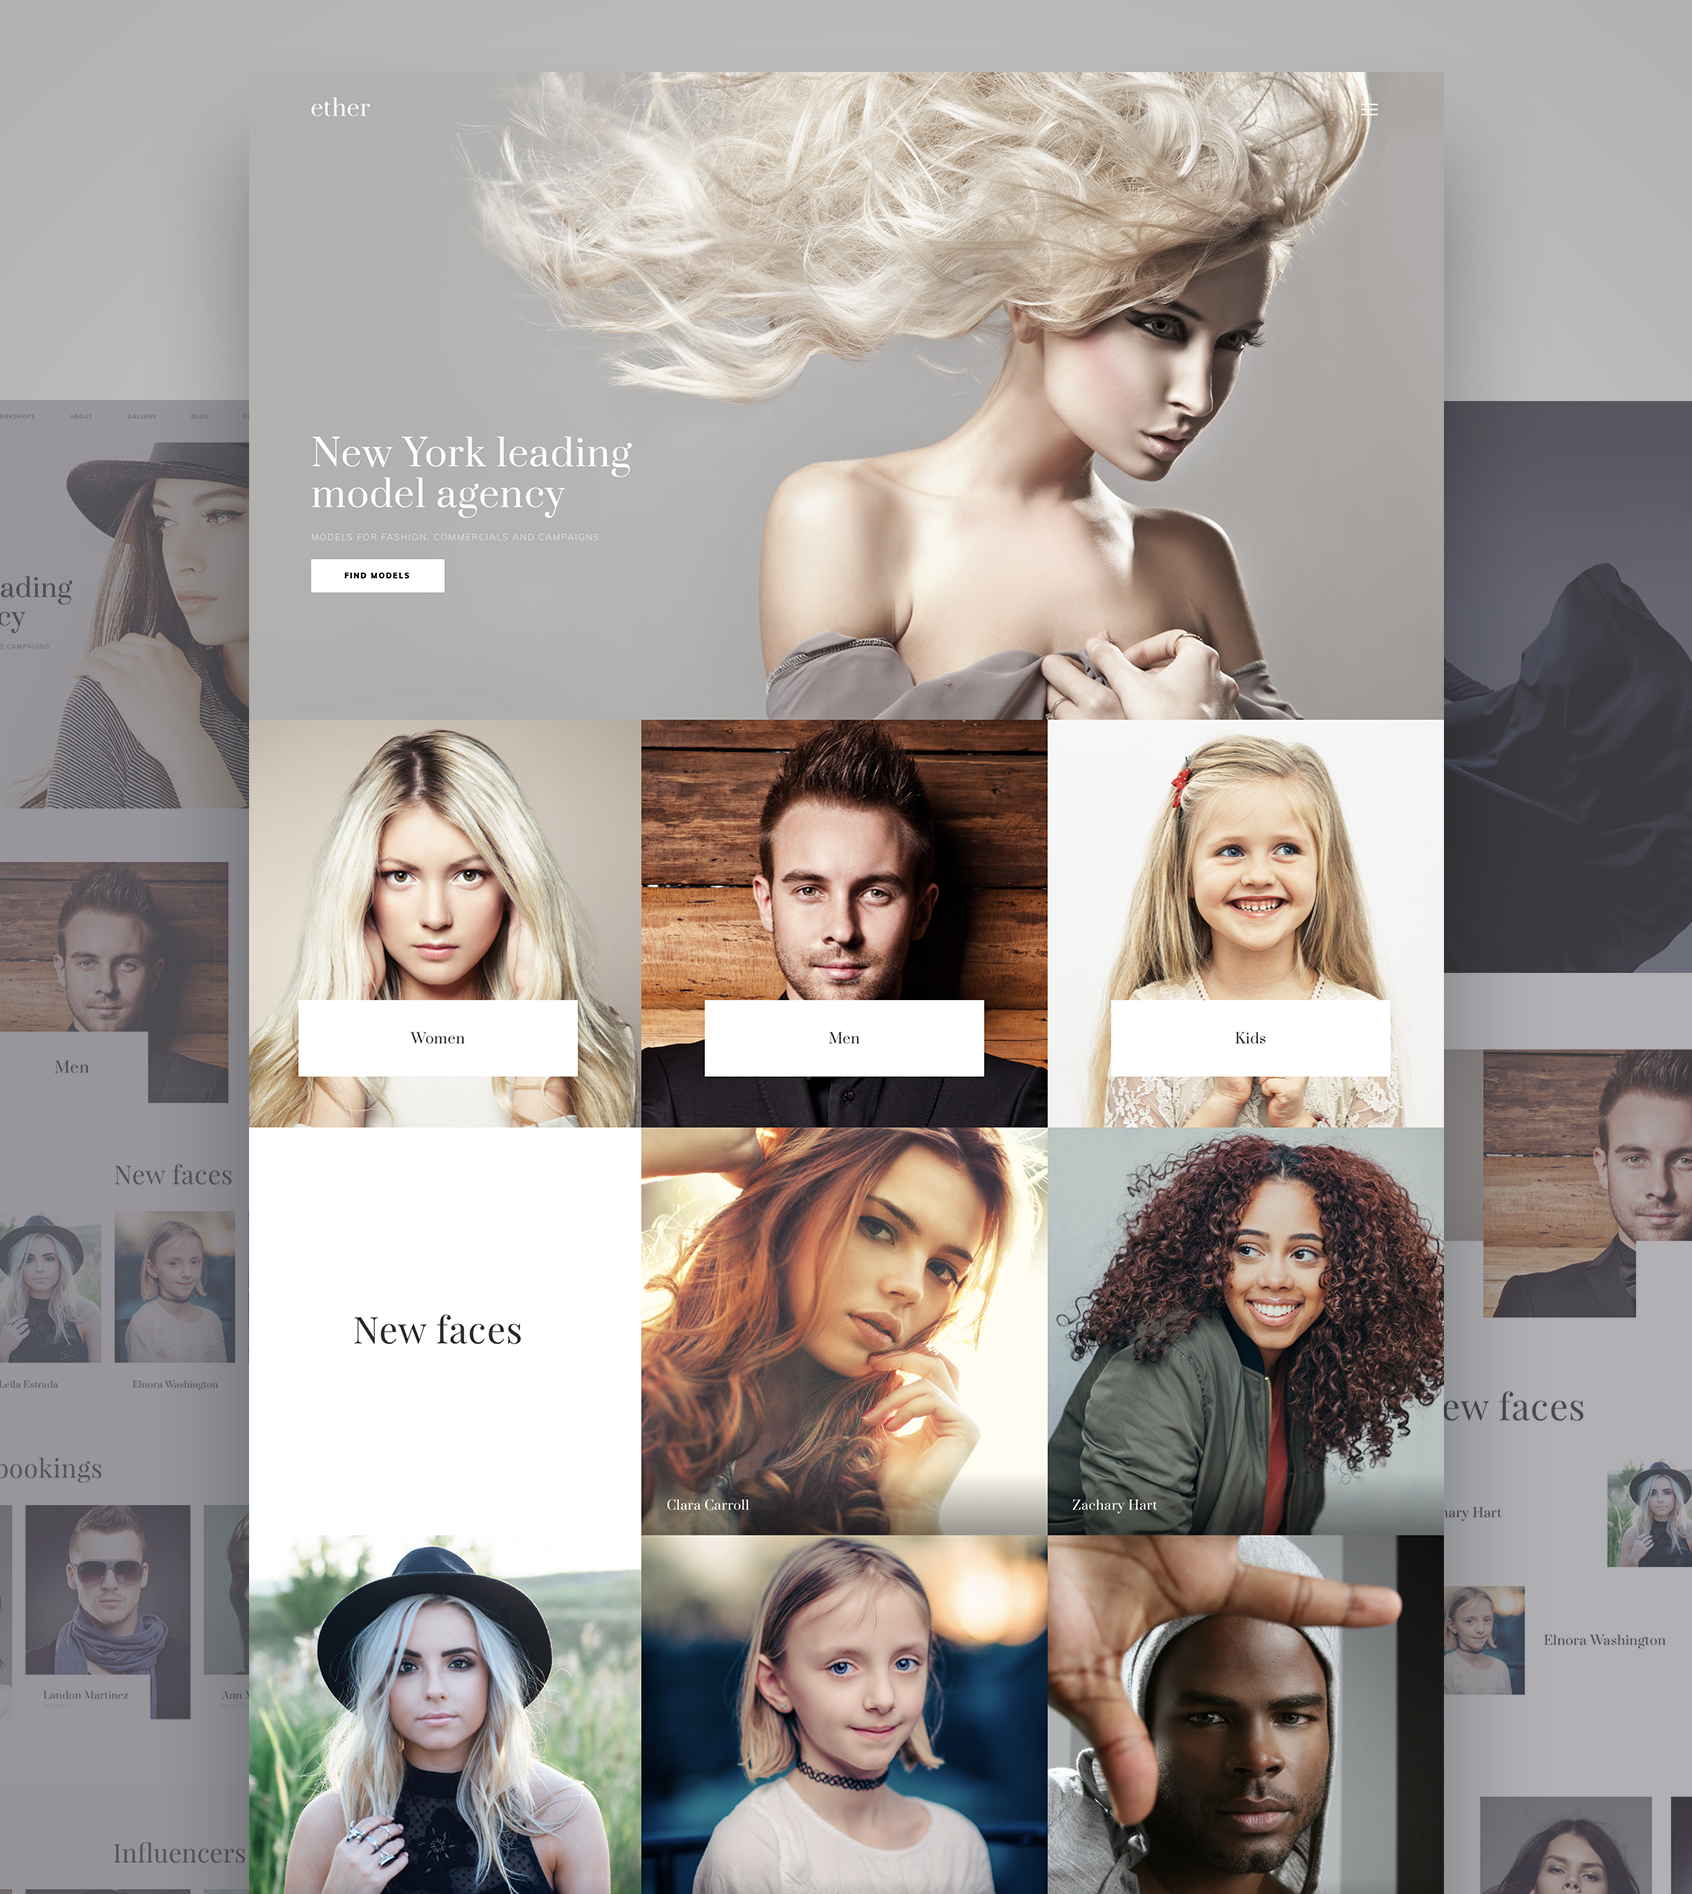 Weblium - Model Agency Website Concept